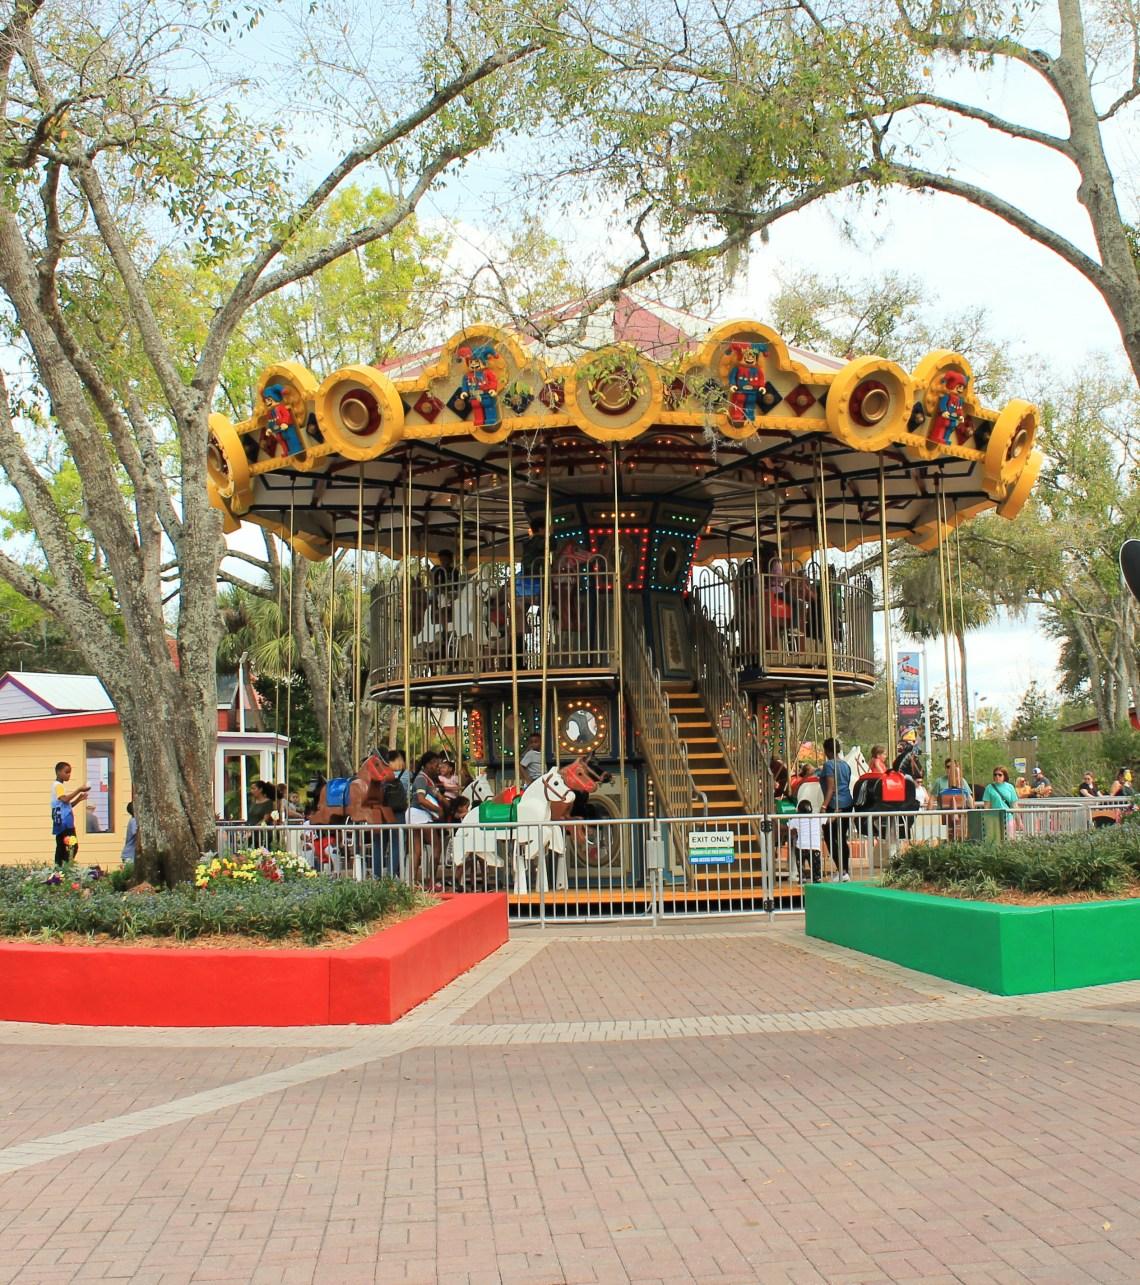 5 Reasons Your Kids Will Love LEGOLAND Florida Resort